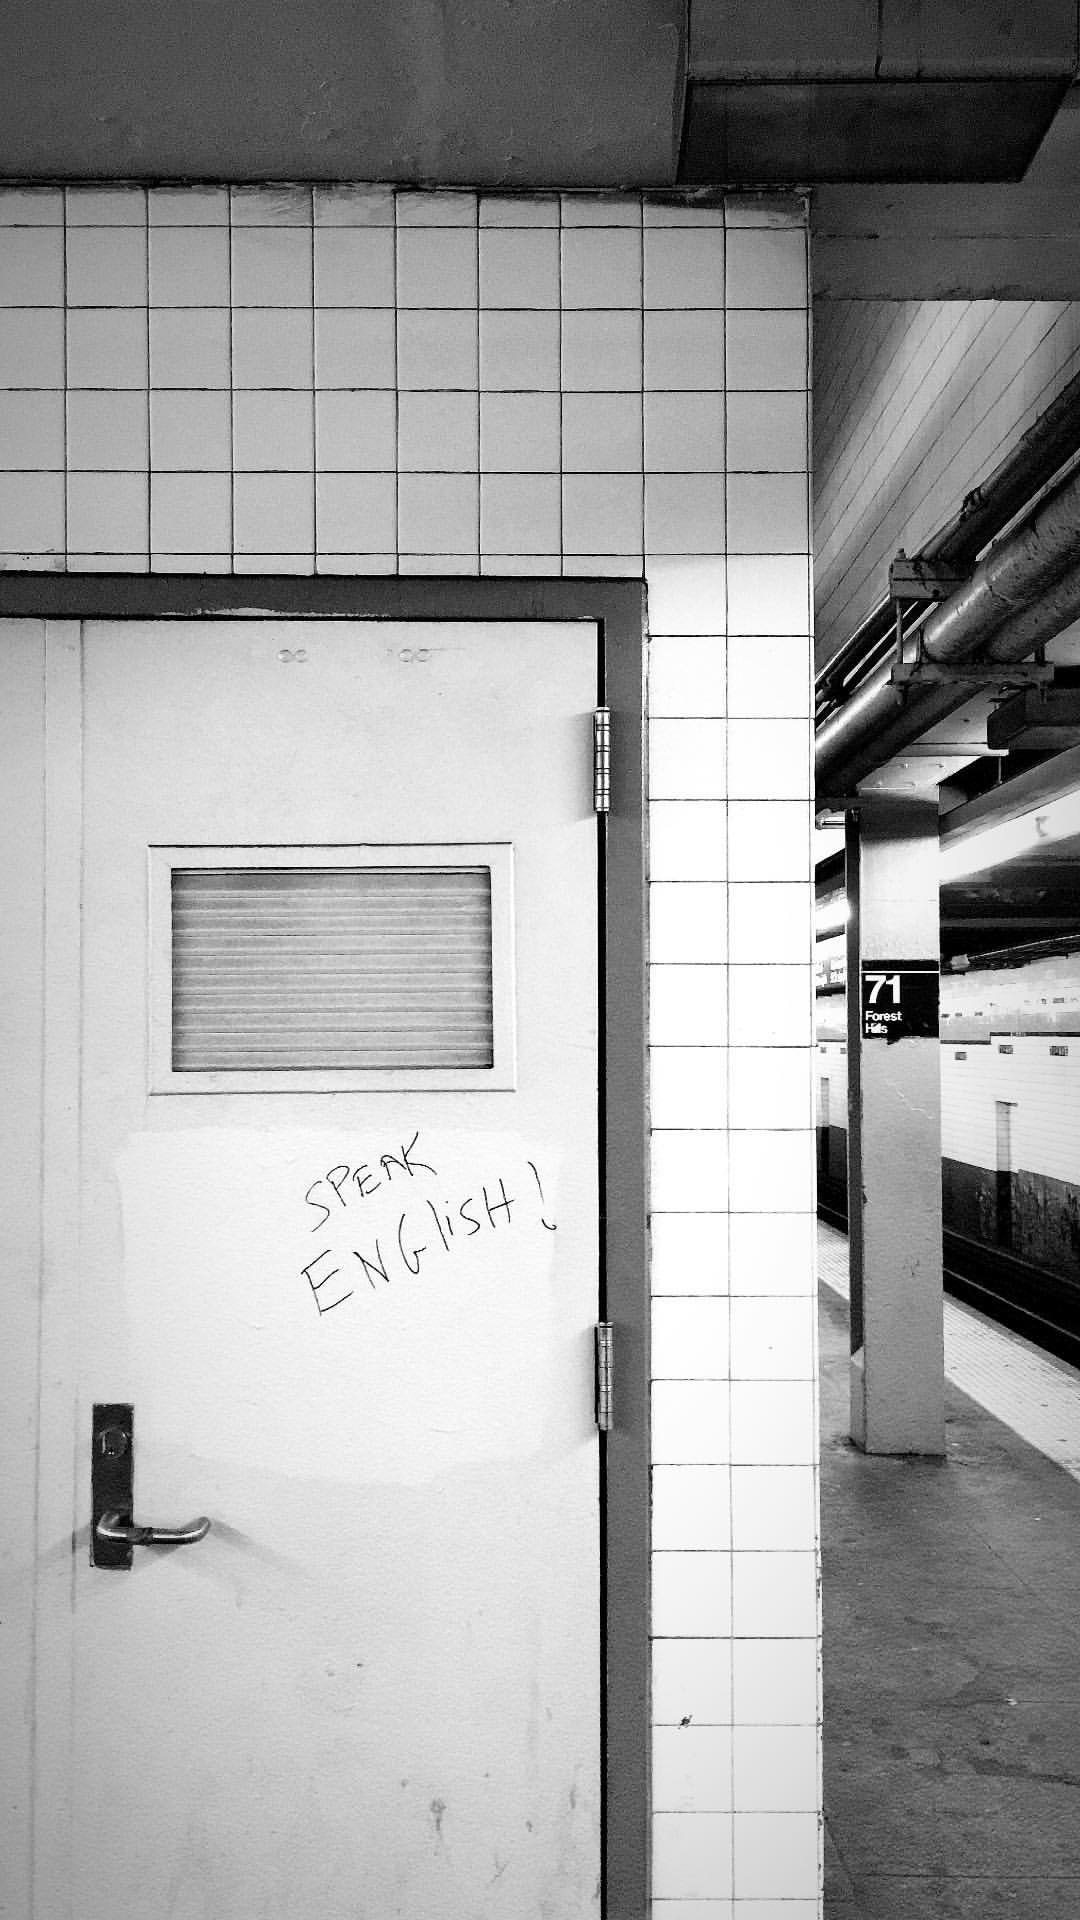 speak english.jpeg